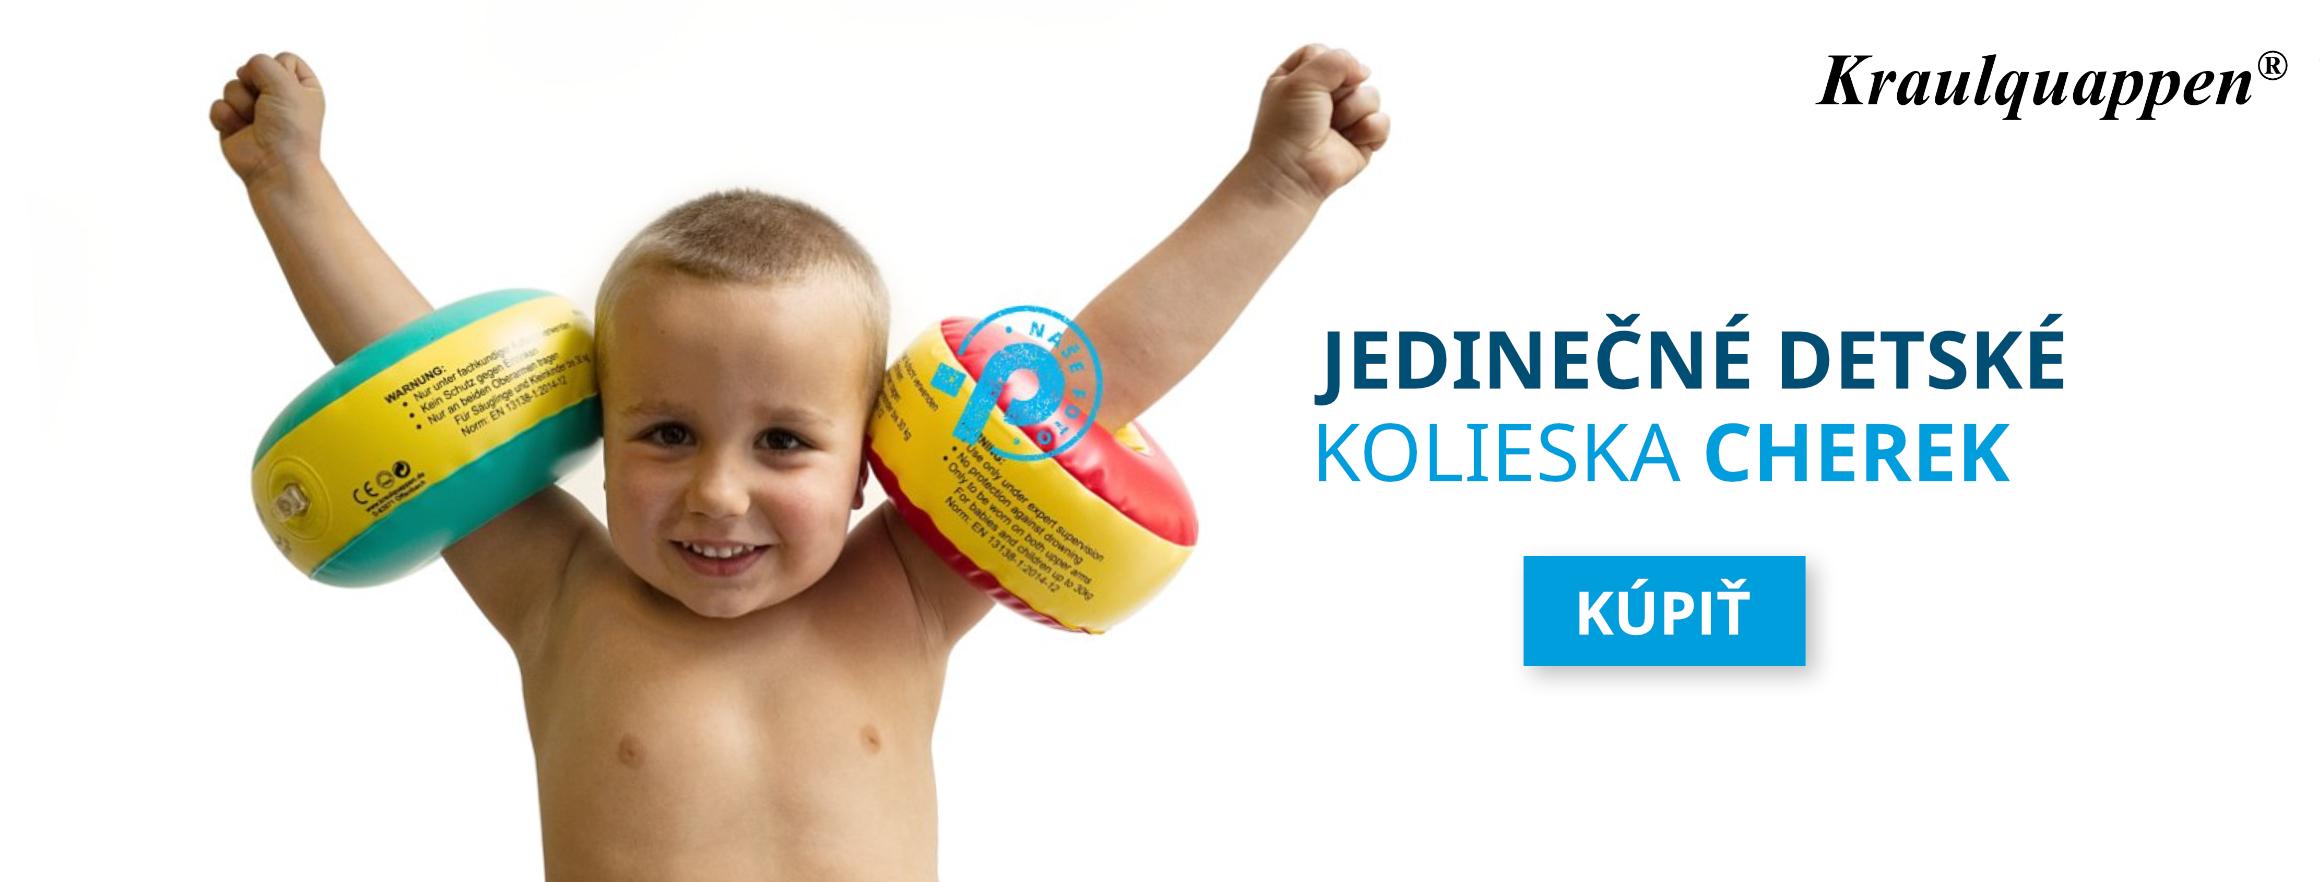 Jedinečné detské kolieska Cherek